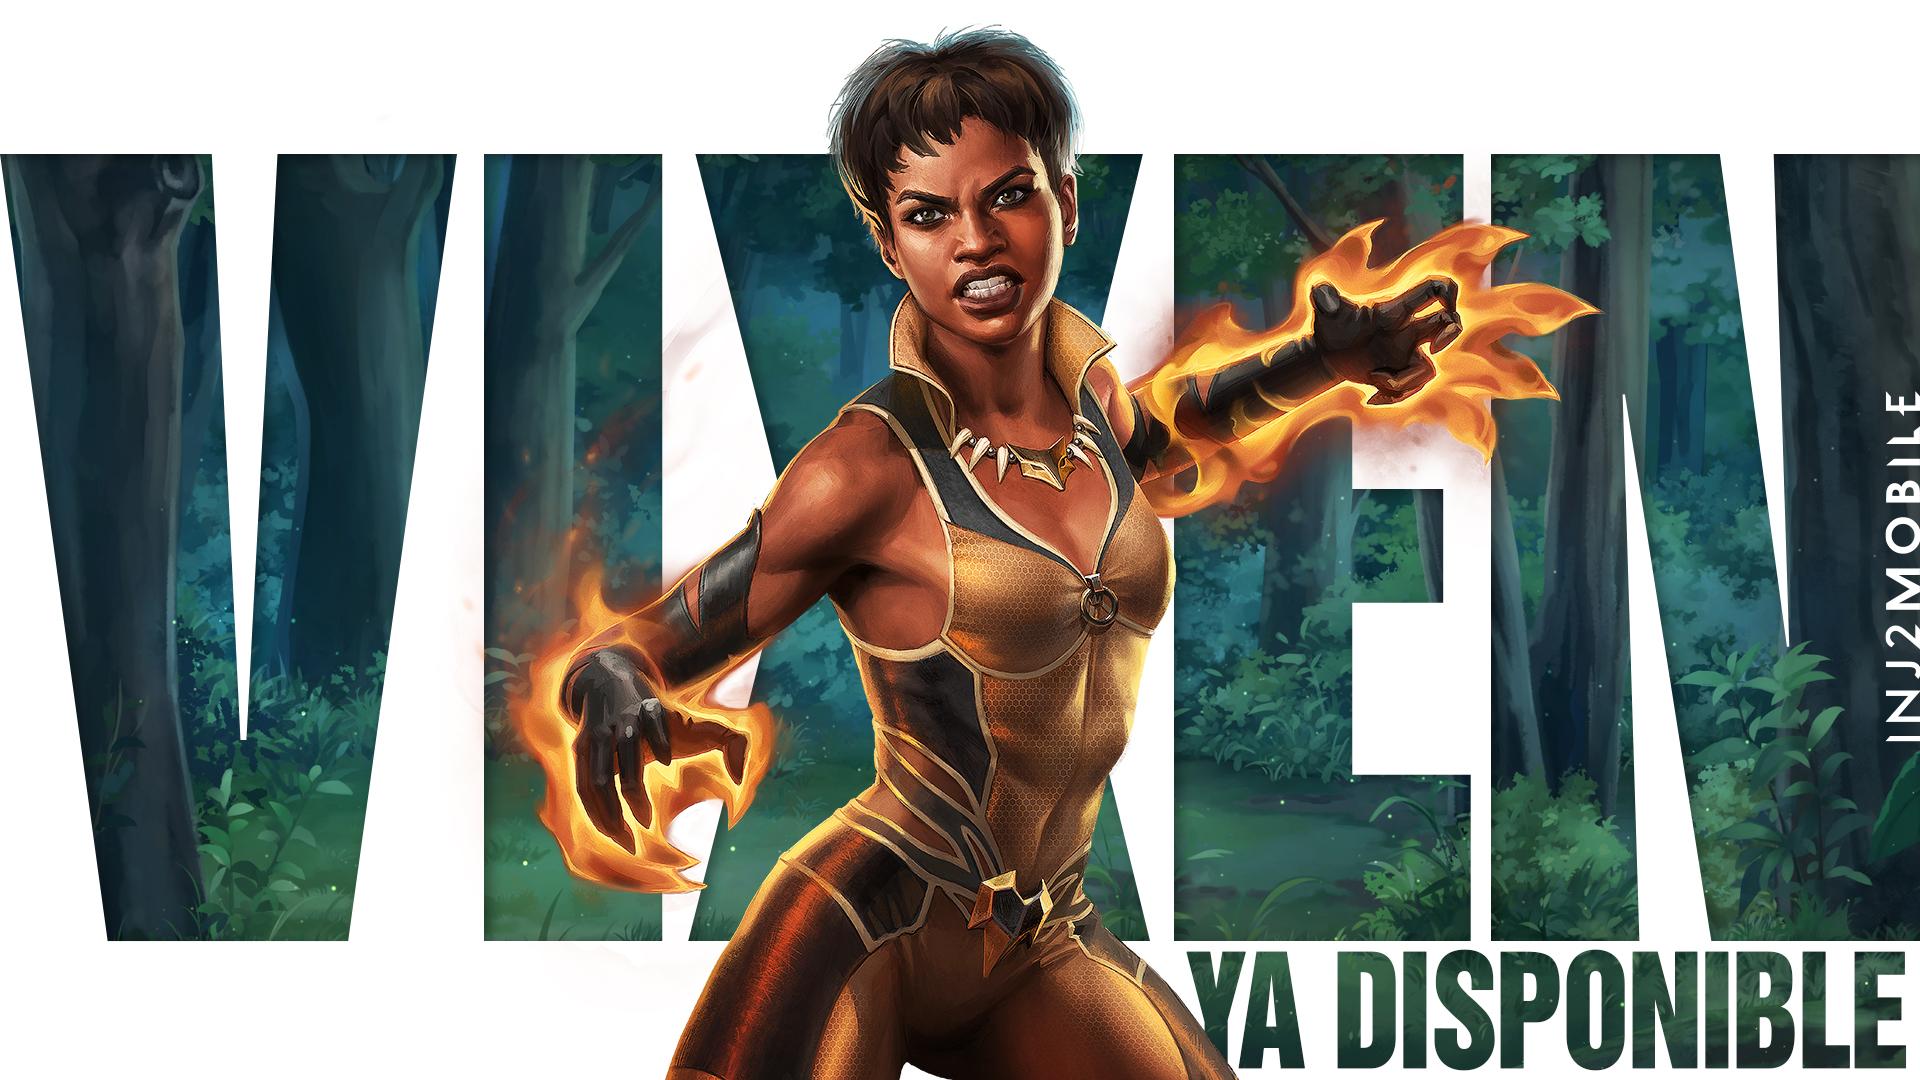 Vixen, injustice 2, injustice mobile, DC